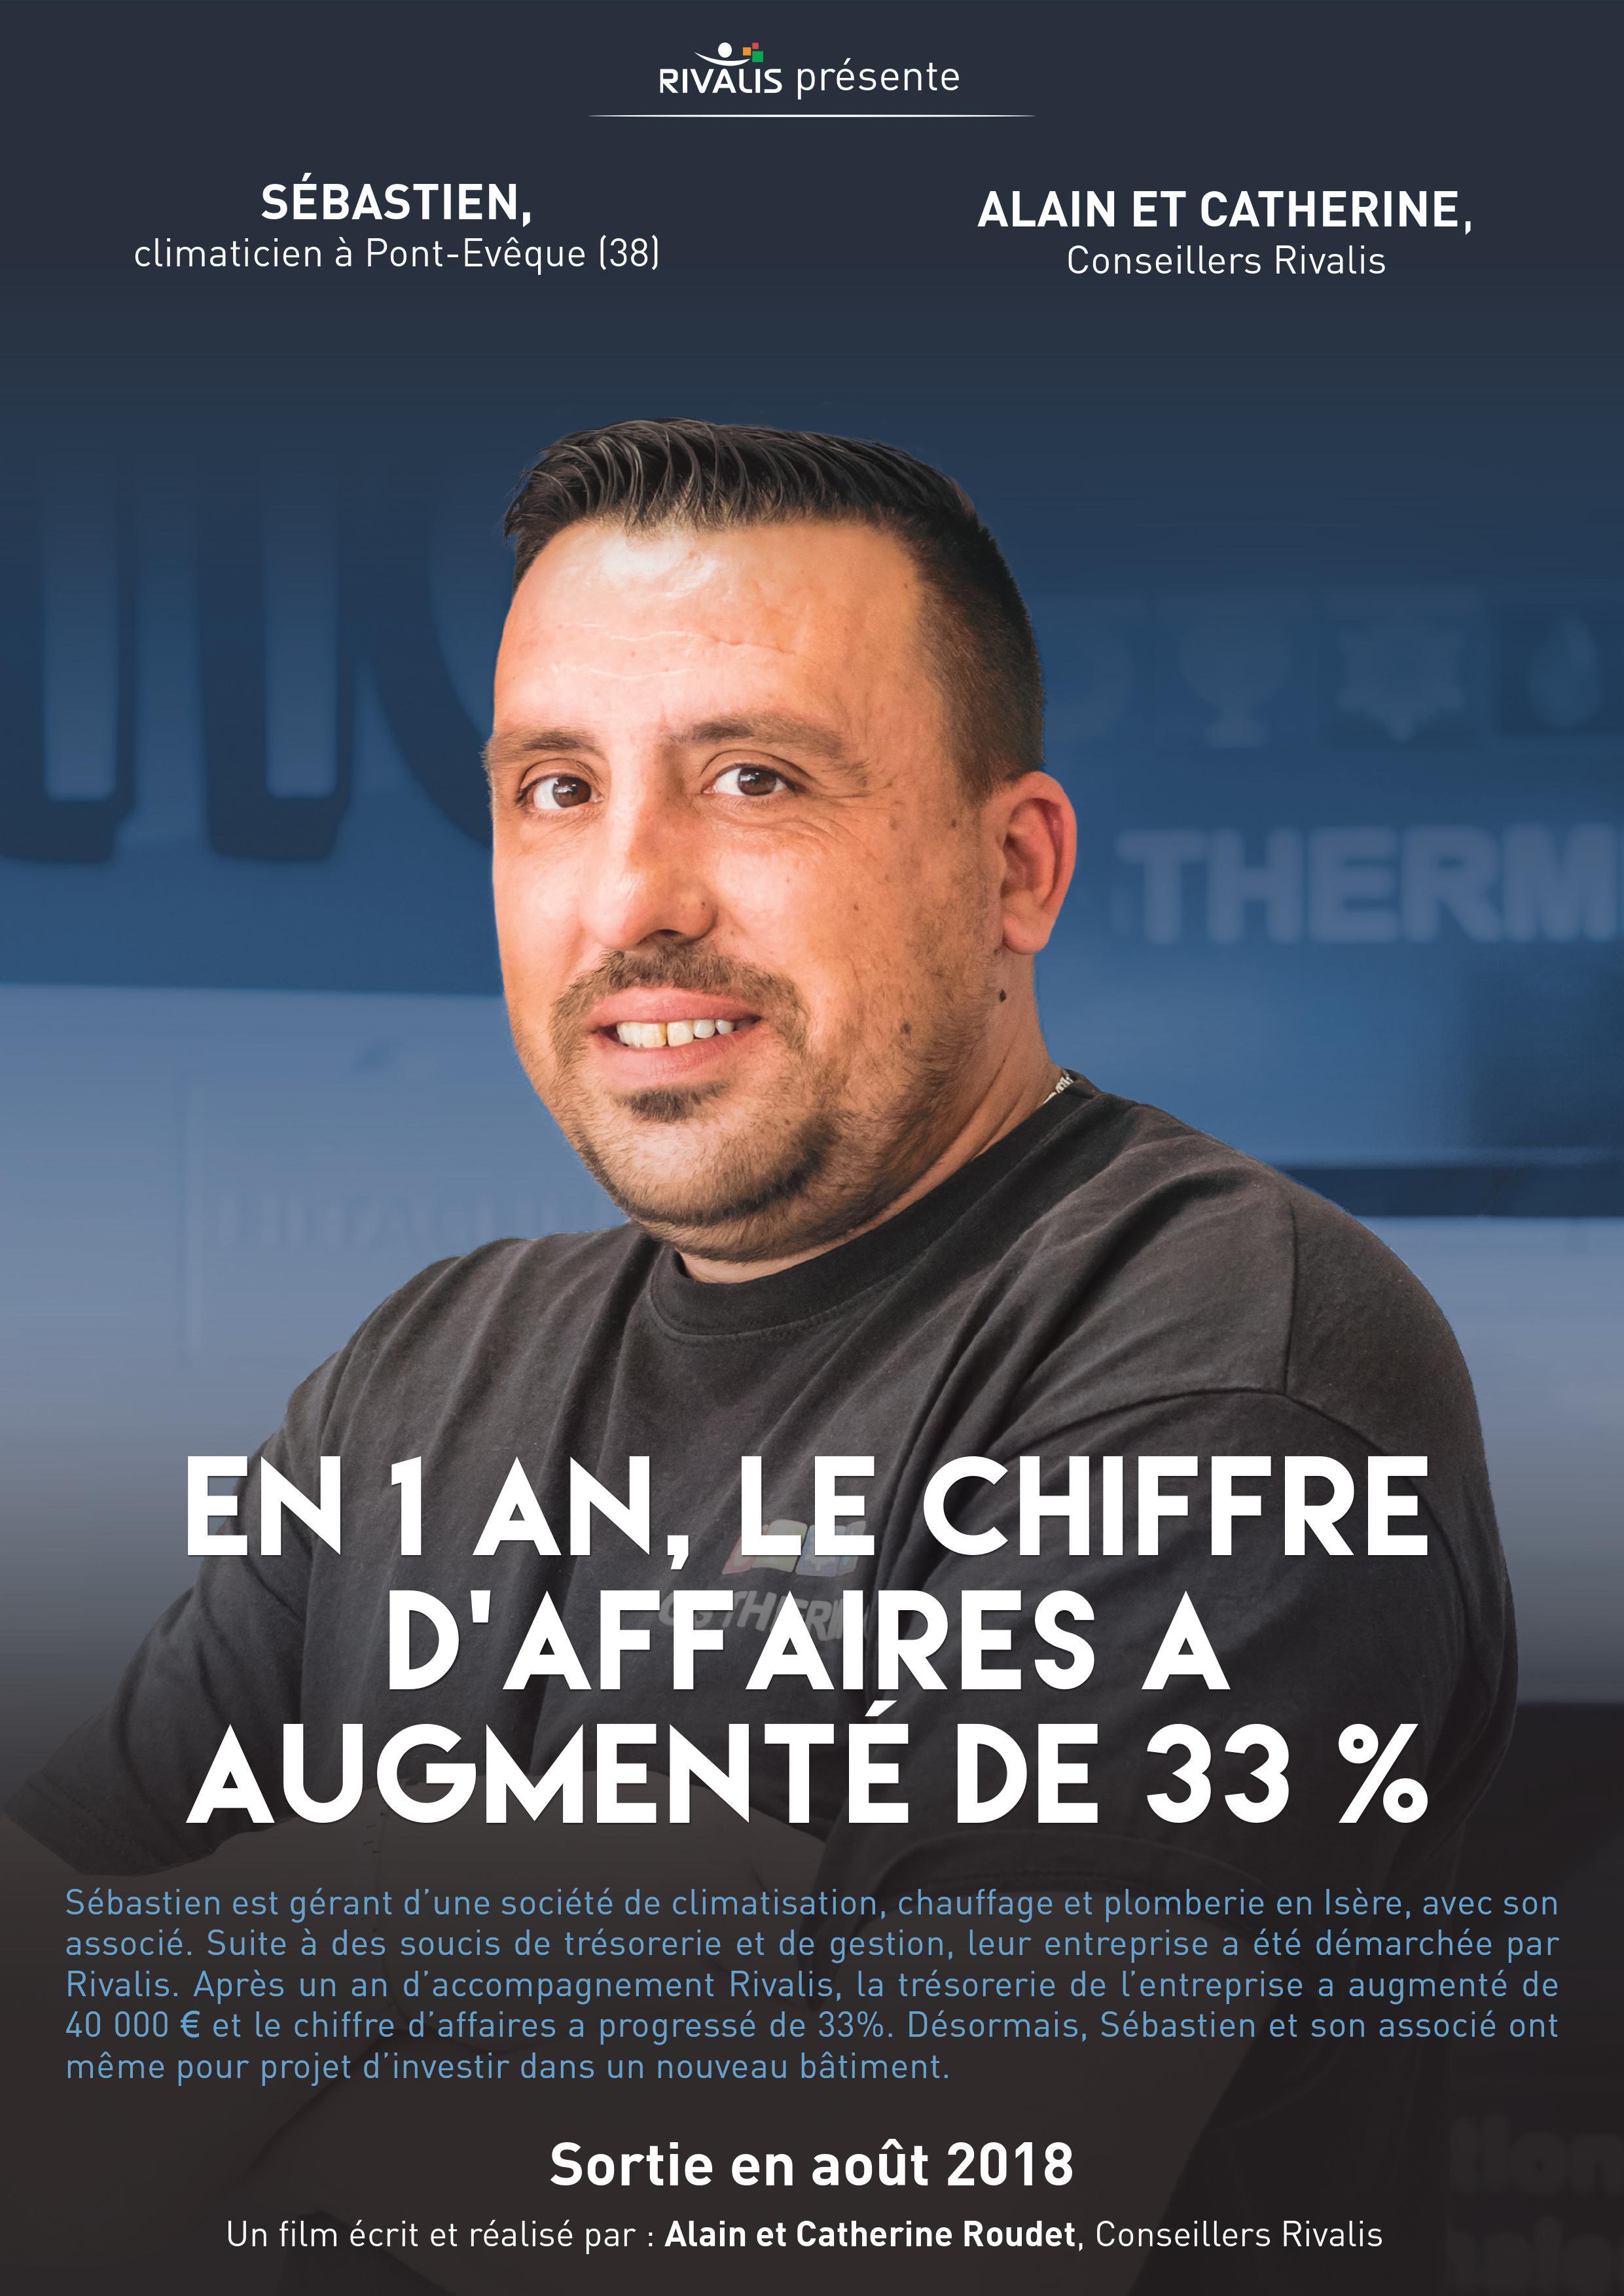 Sébastien, climaticien